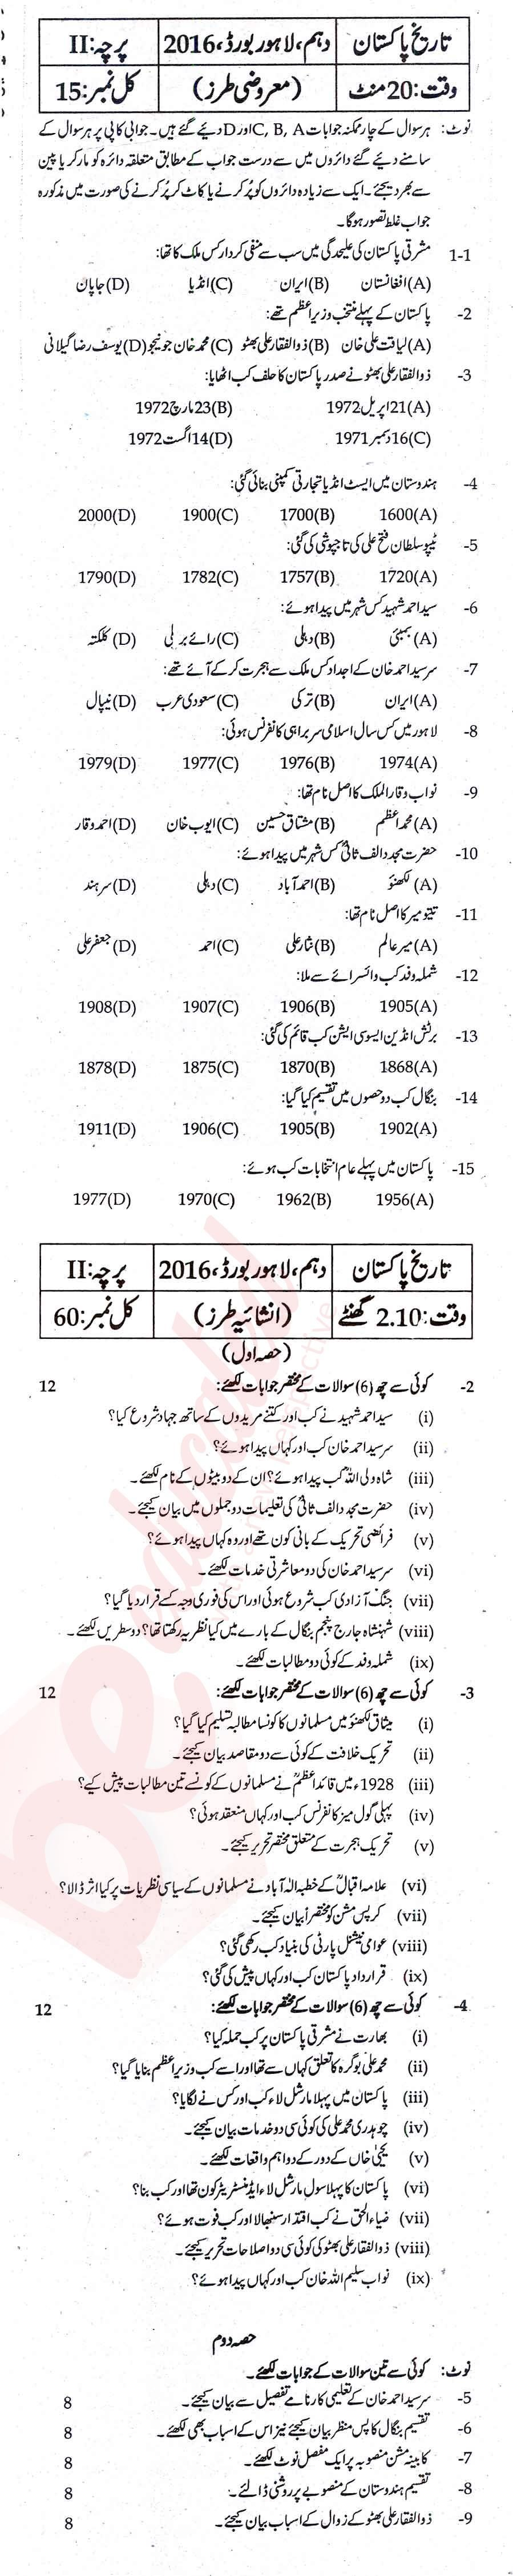 Pakistan History 10th Urdu Medium Past Paper Group 1 BISE